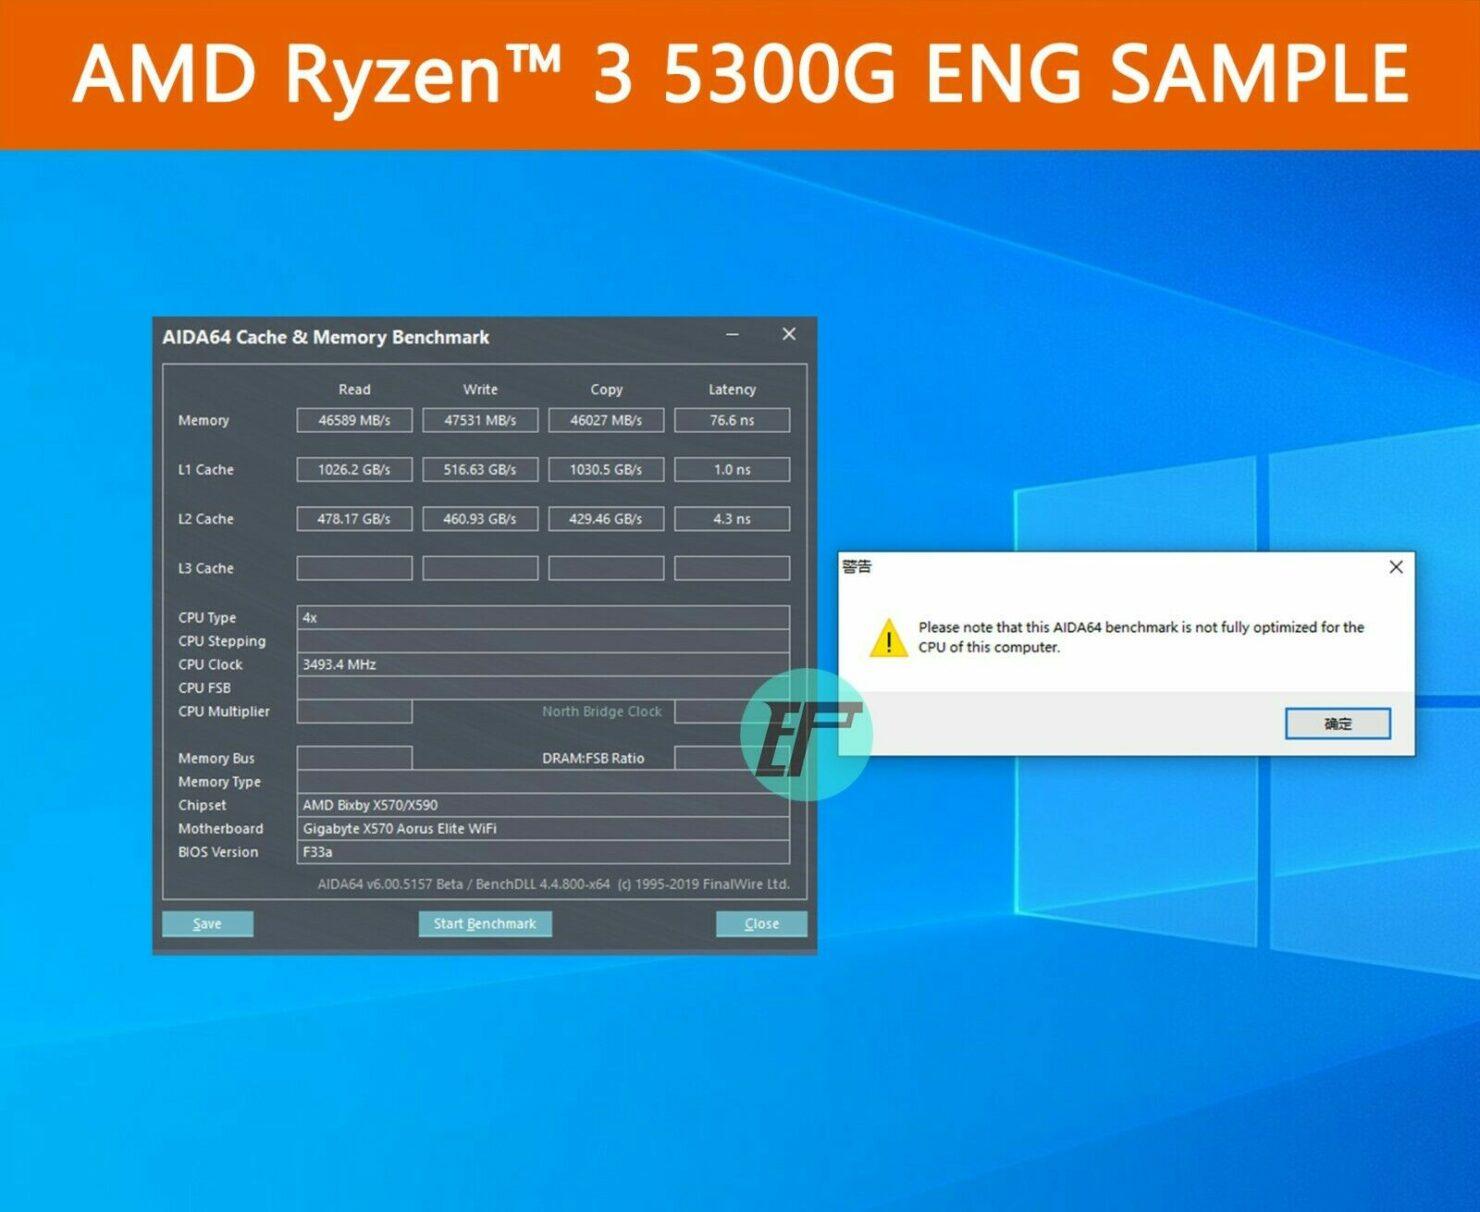 amd-ryzen-5-5300g-4-core-zen-3-desktop-apu-_-benchmarks-_14